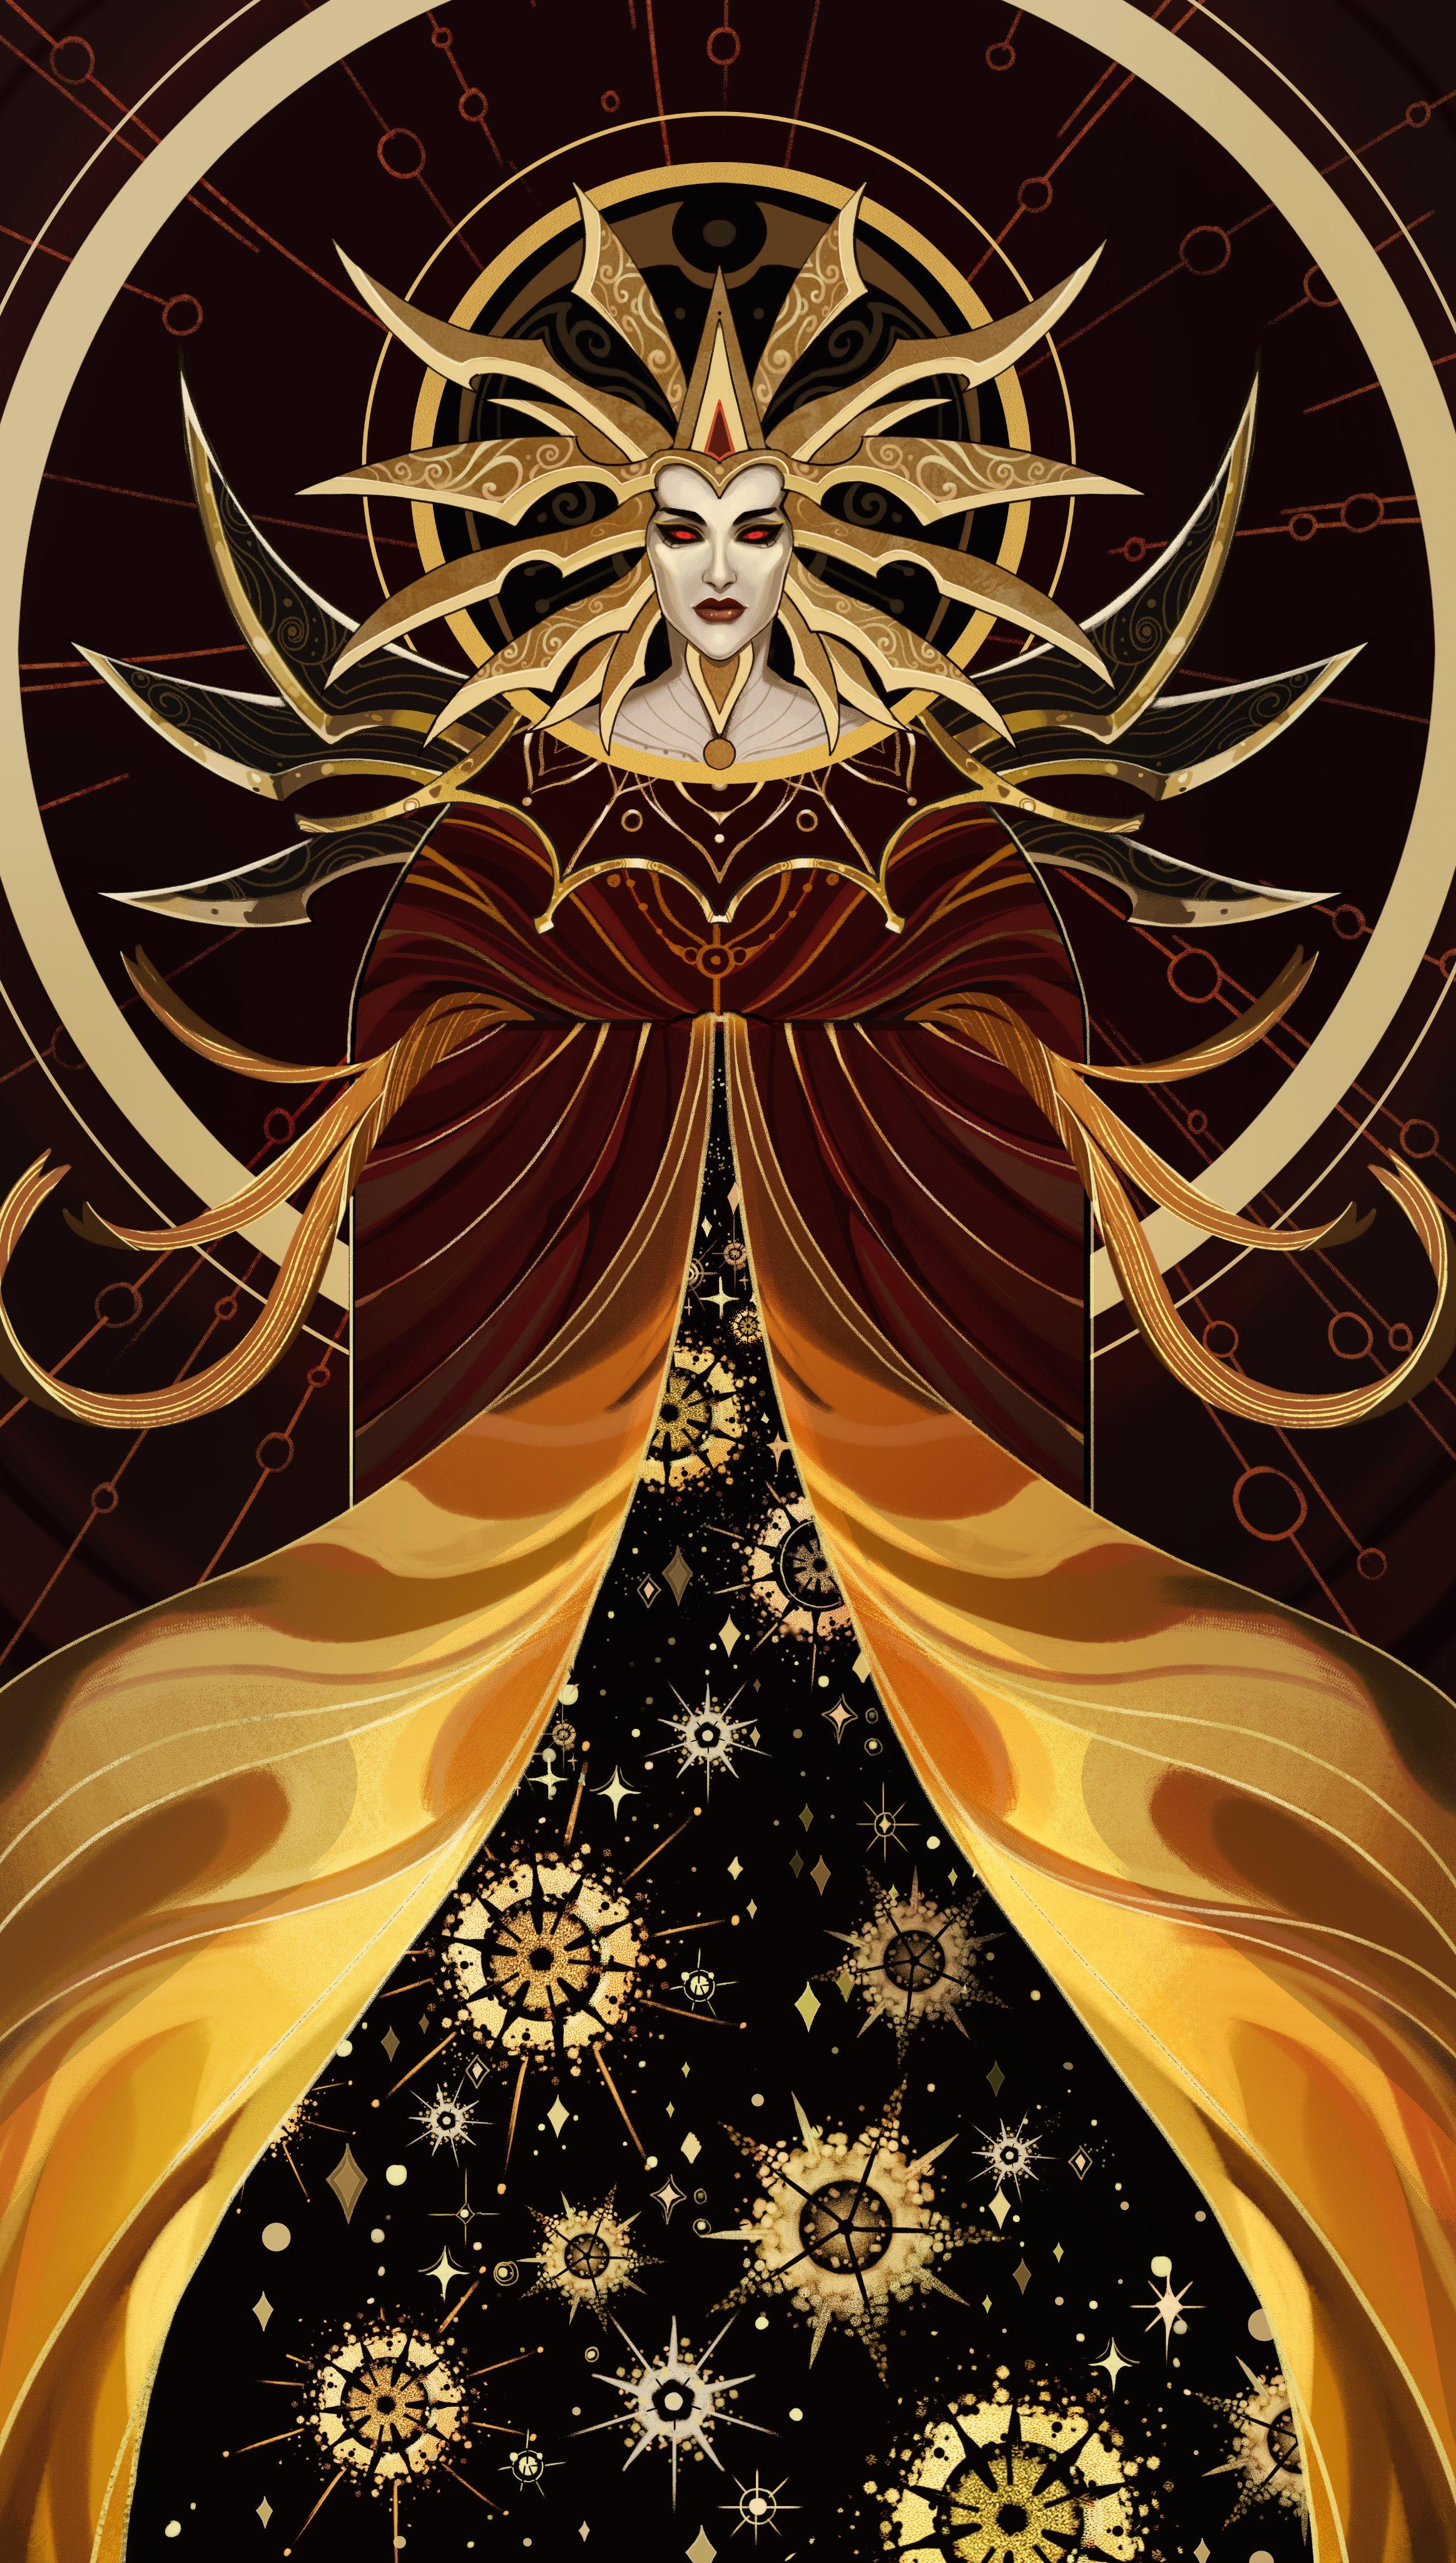 lady-of-pain commission Lady of Pain, commissione per @TylerPhillippi - by Lilit Beglarian (Somatrasiel) www.twitter.com/Somatrasiel (2021-03) © dell'autore, tutti i diritti riservati